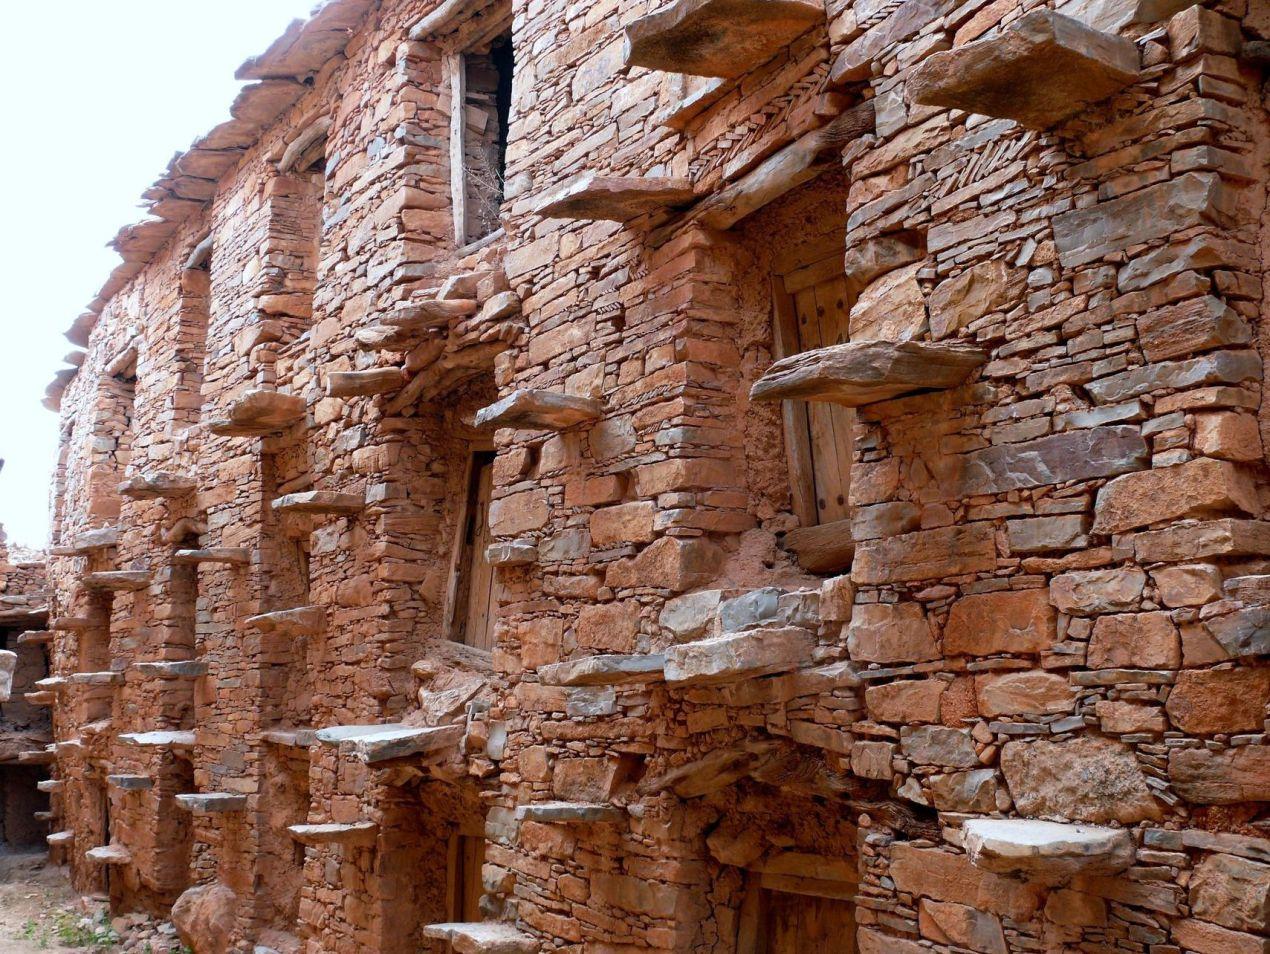 morocco-agadir-greniers-fortifies-11532103781